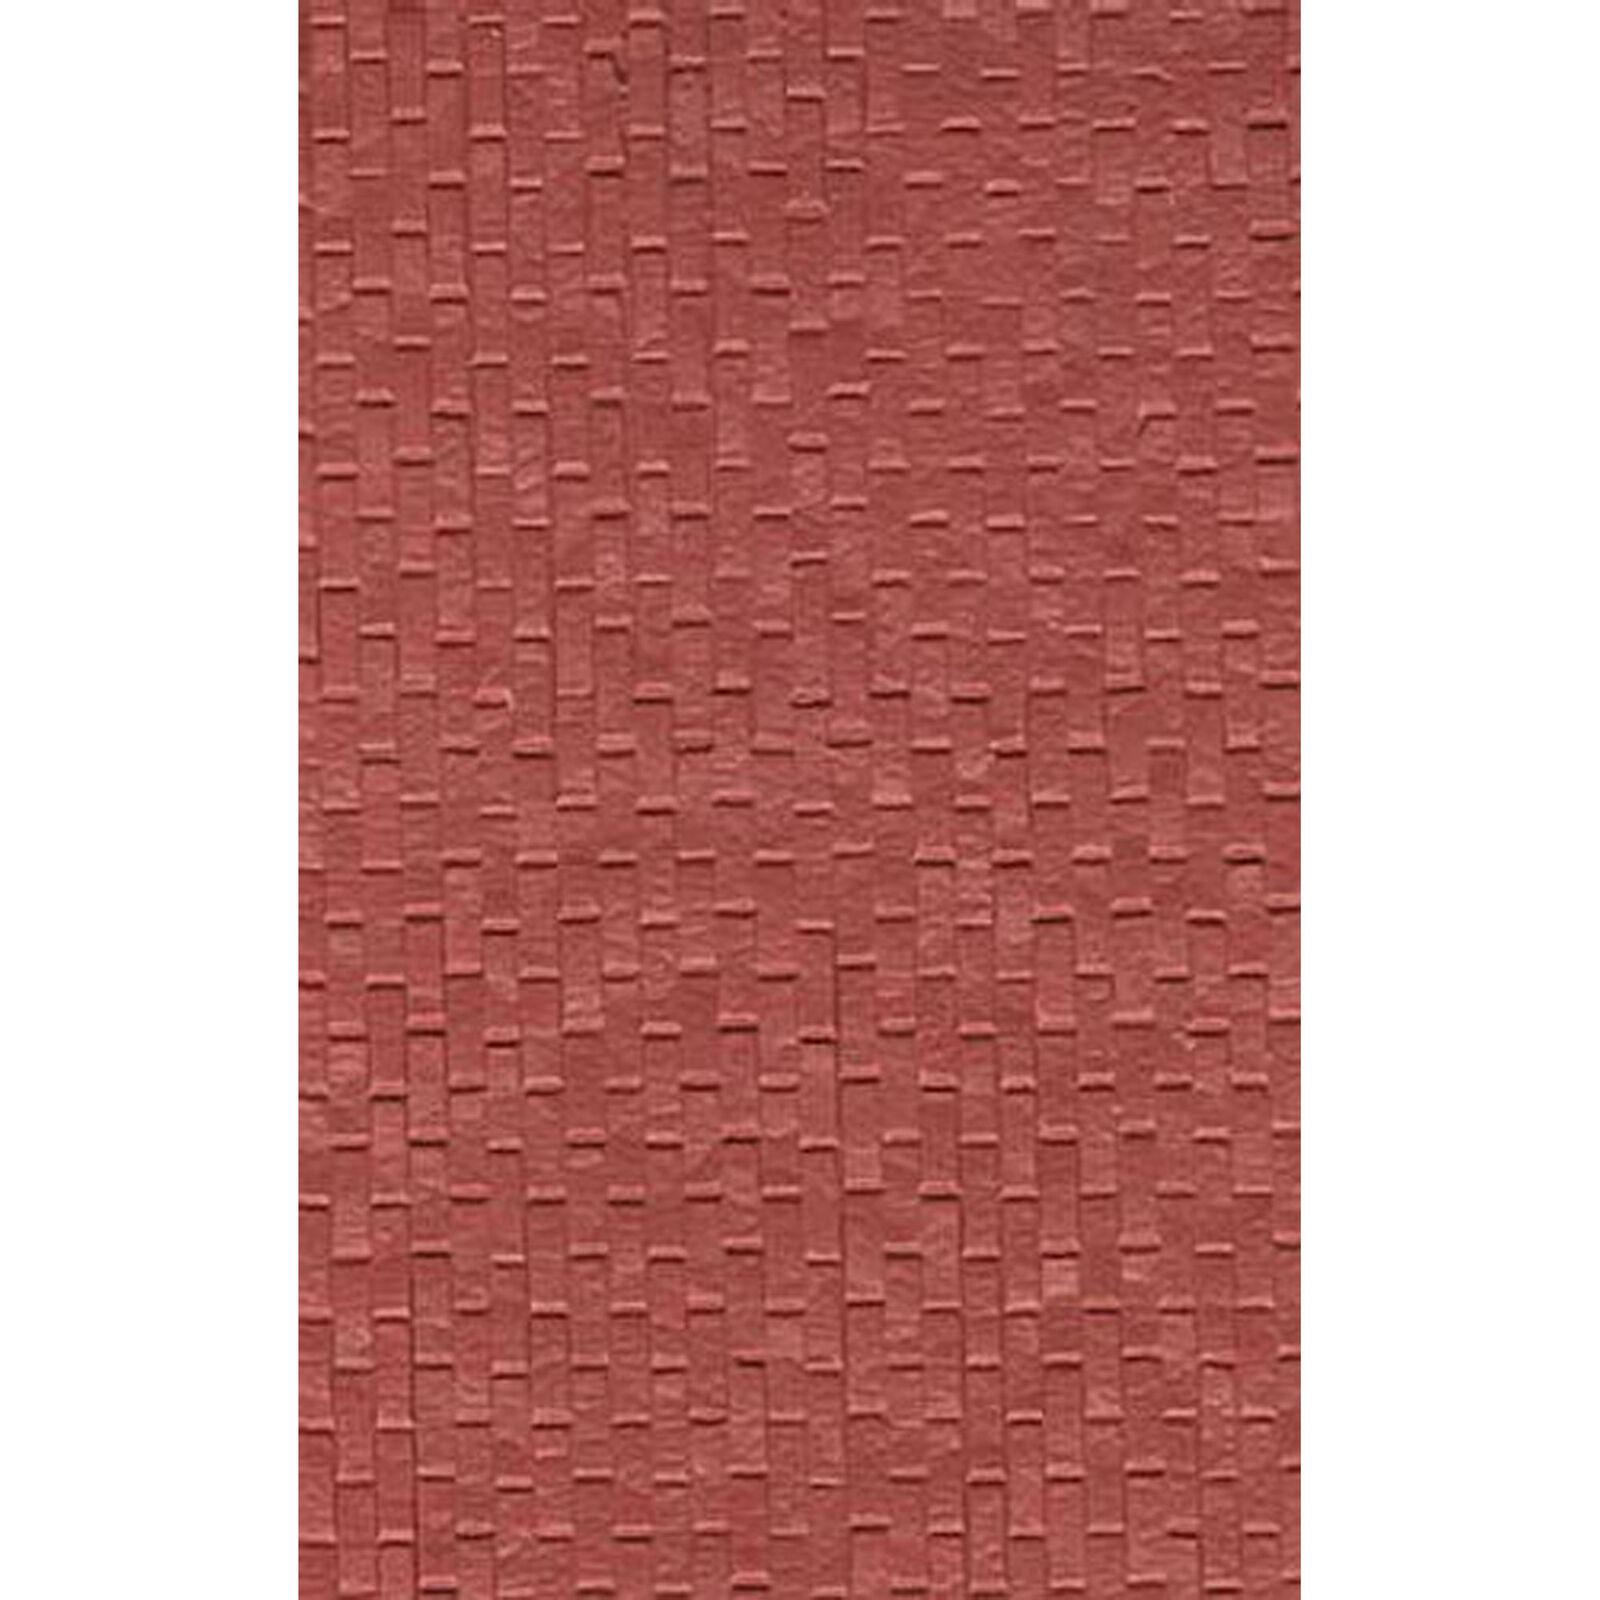 G Rough Bricks (2)